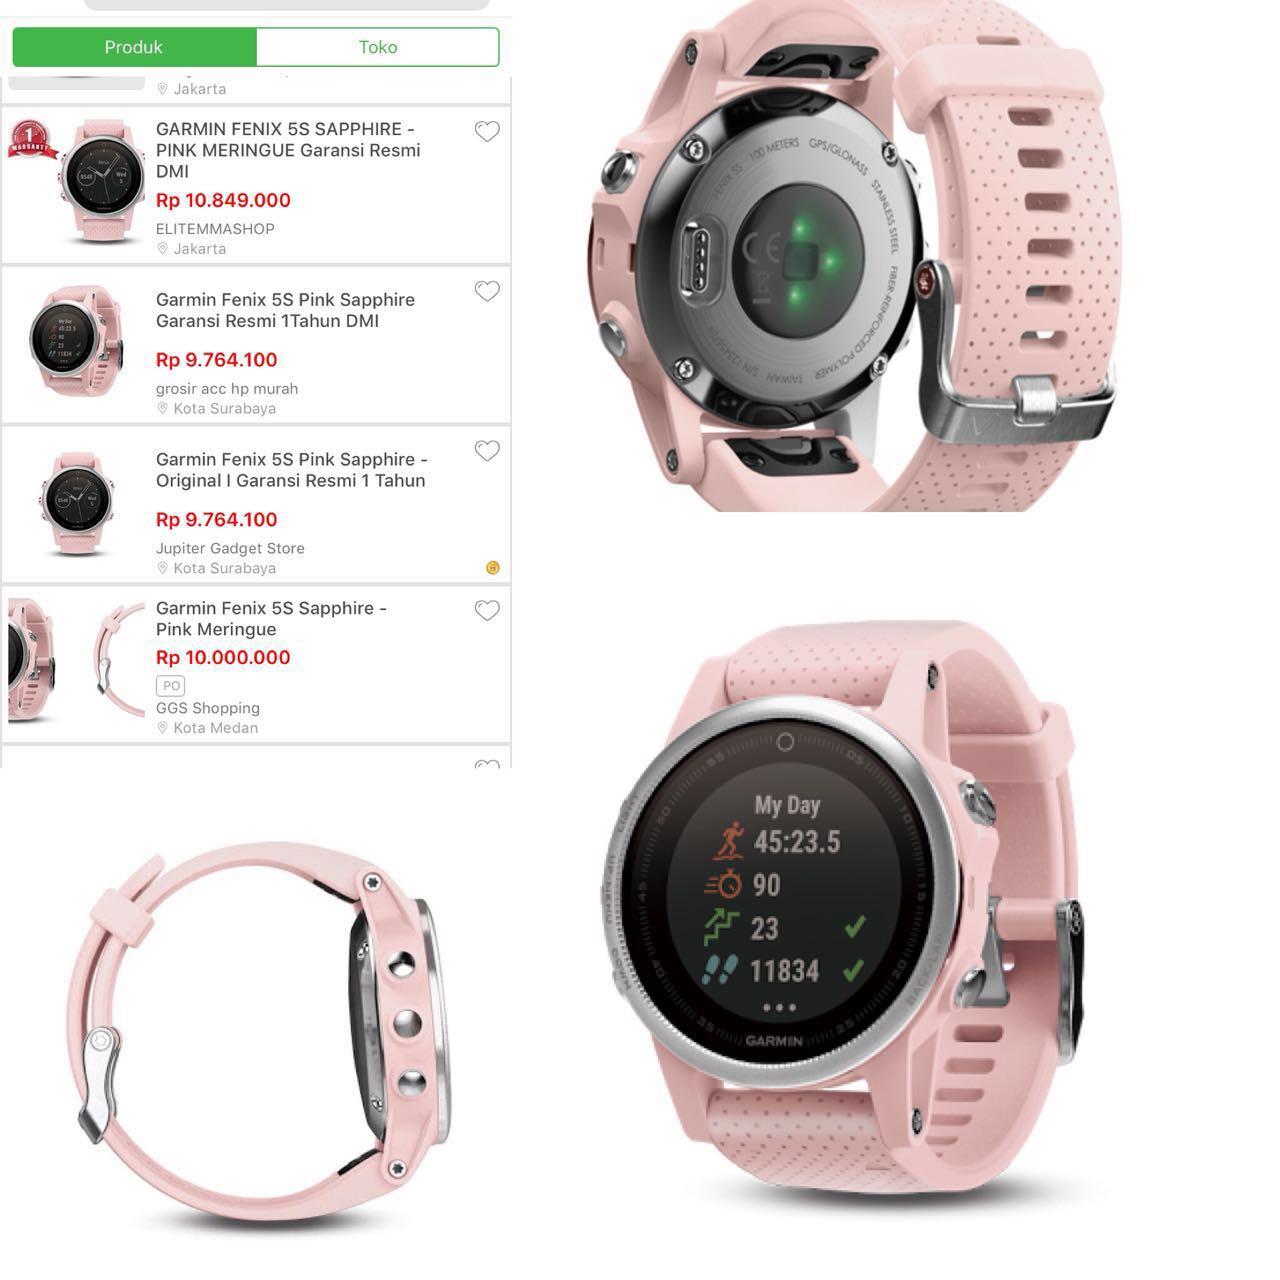 Garmin Fenix 5S Sapphire Smartwatch - Pink 8f649c383c